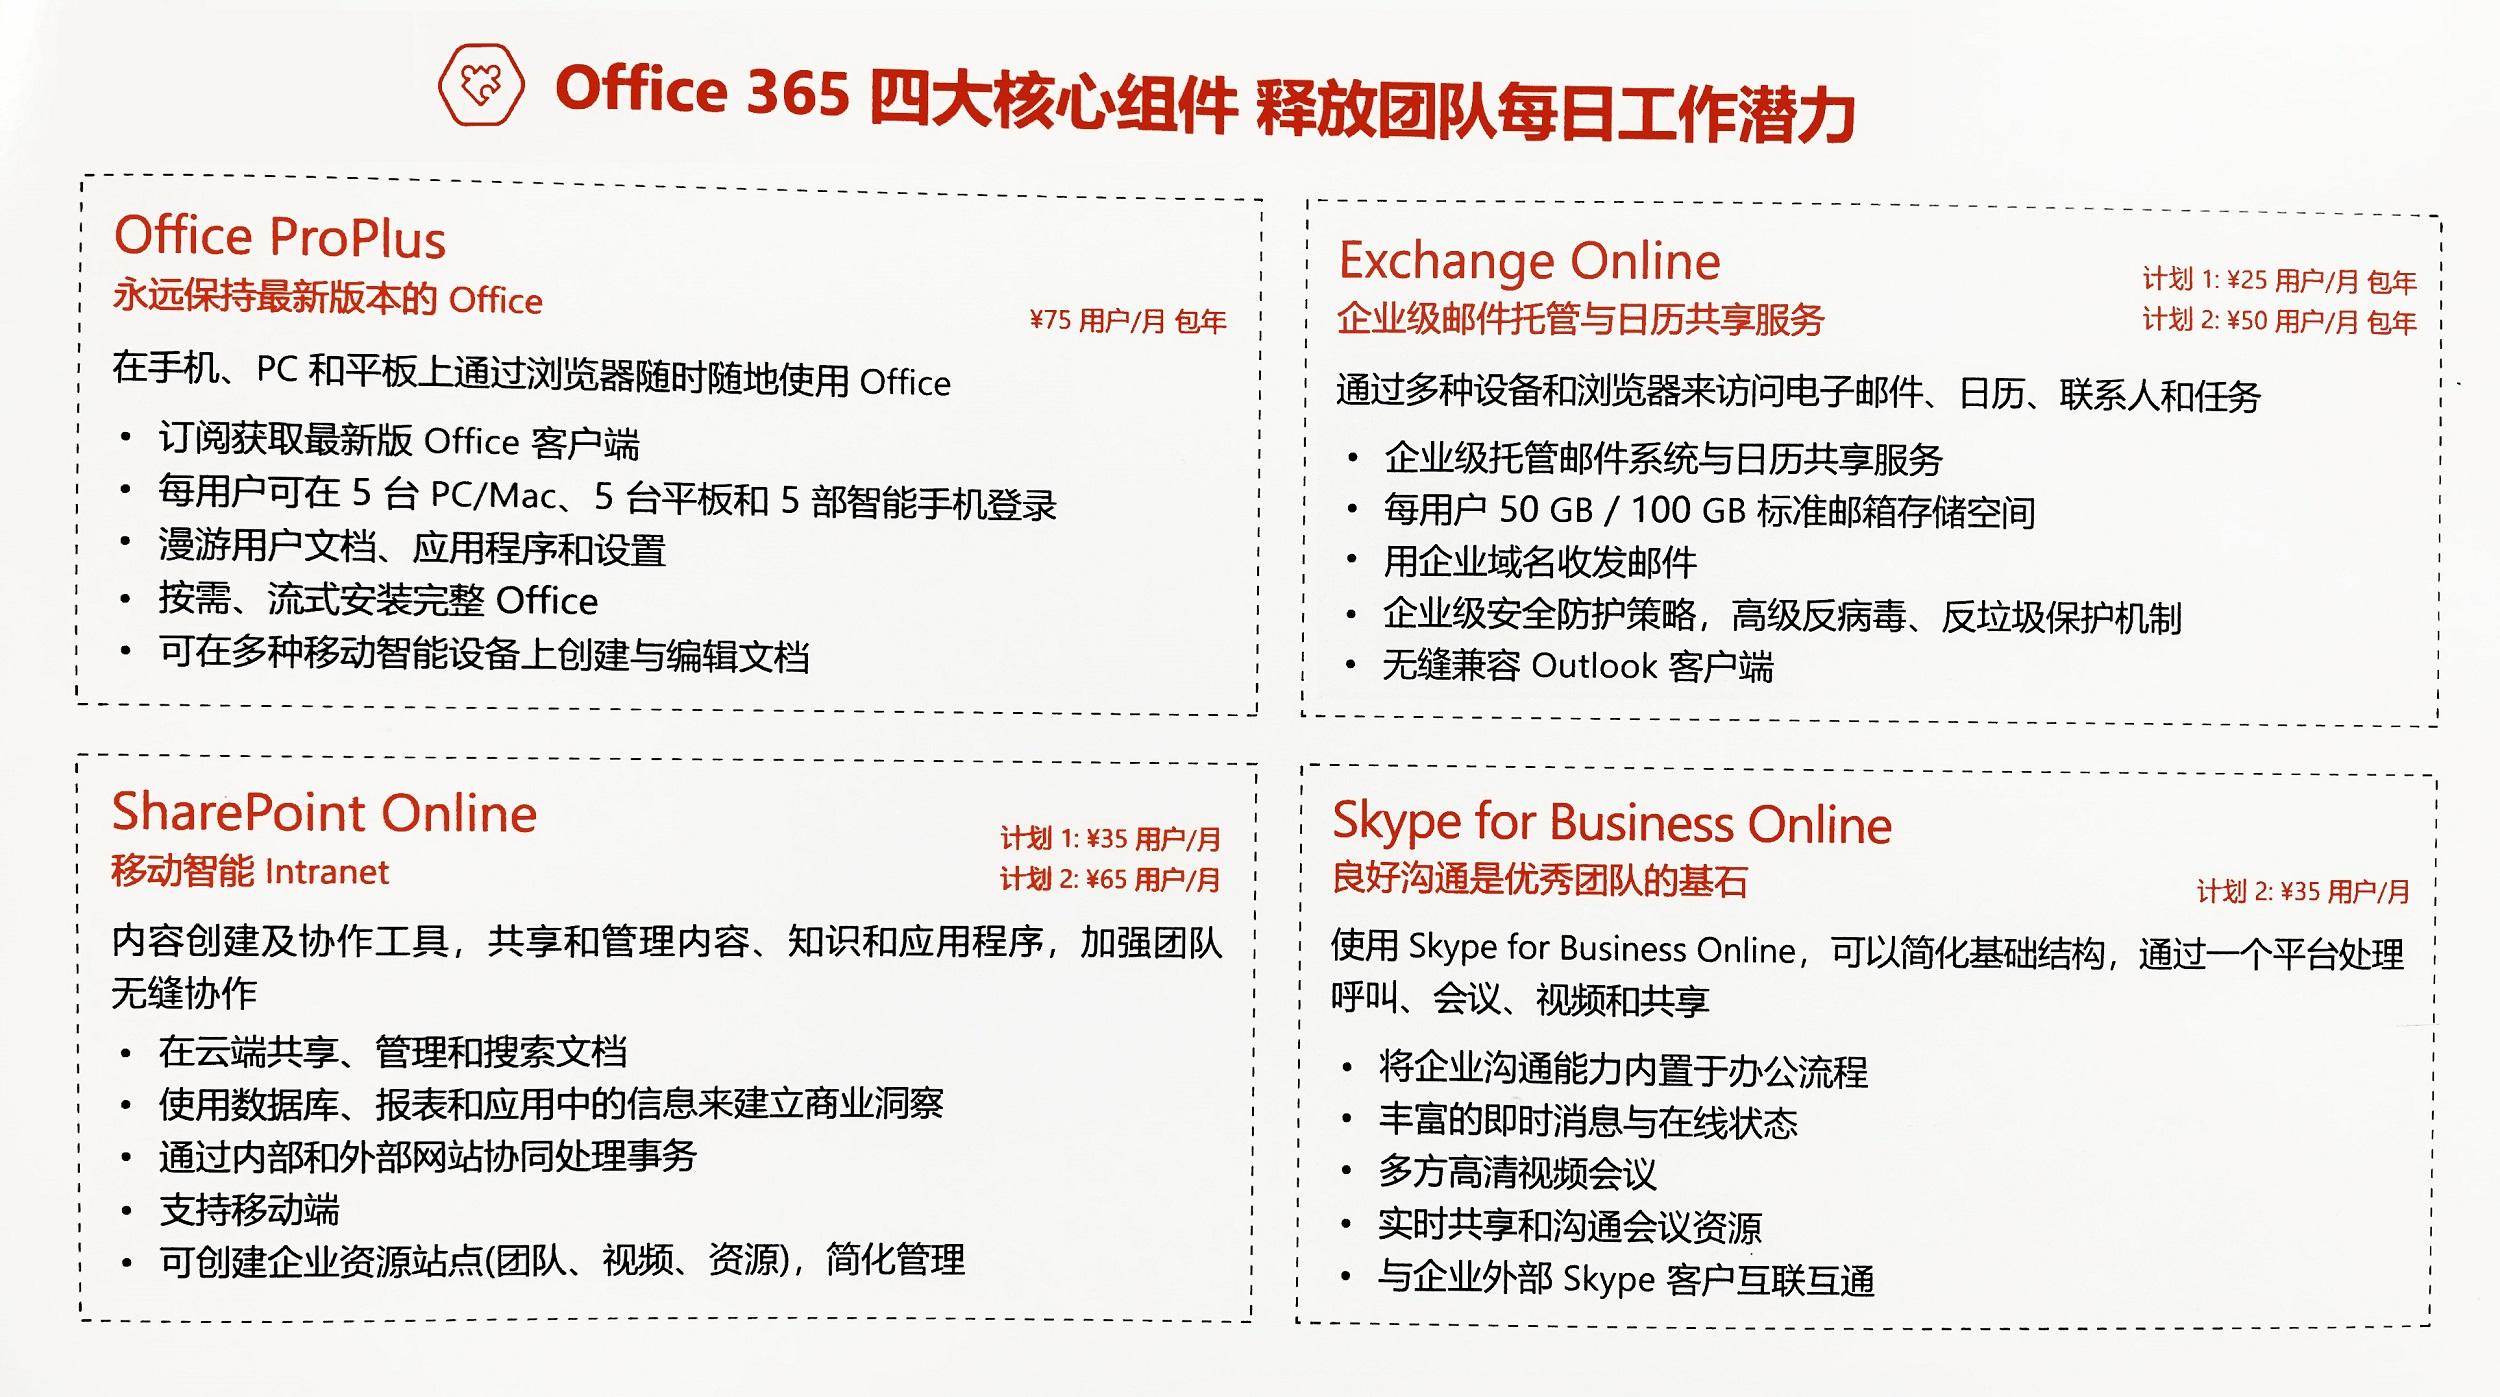 Office 365四大核心组件